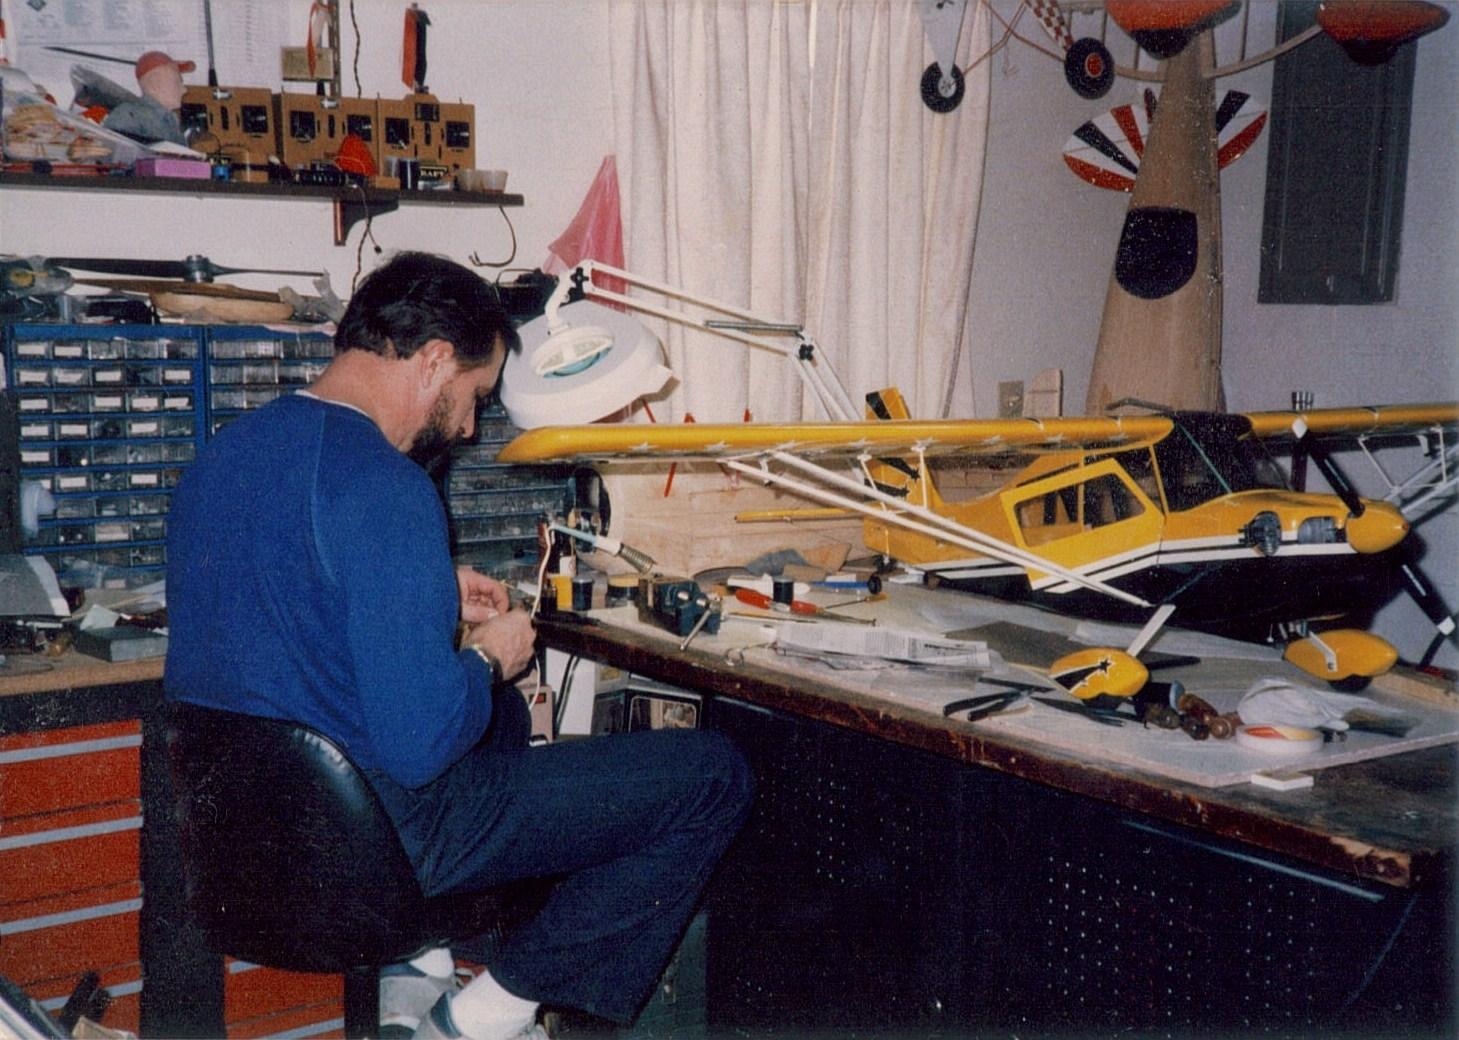 Click image for larger version  Name:Pilot Belanca Citabria.jpg Views:337 Size:375.3 KB ID:2054026